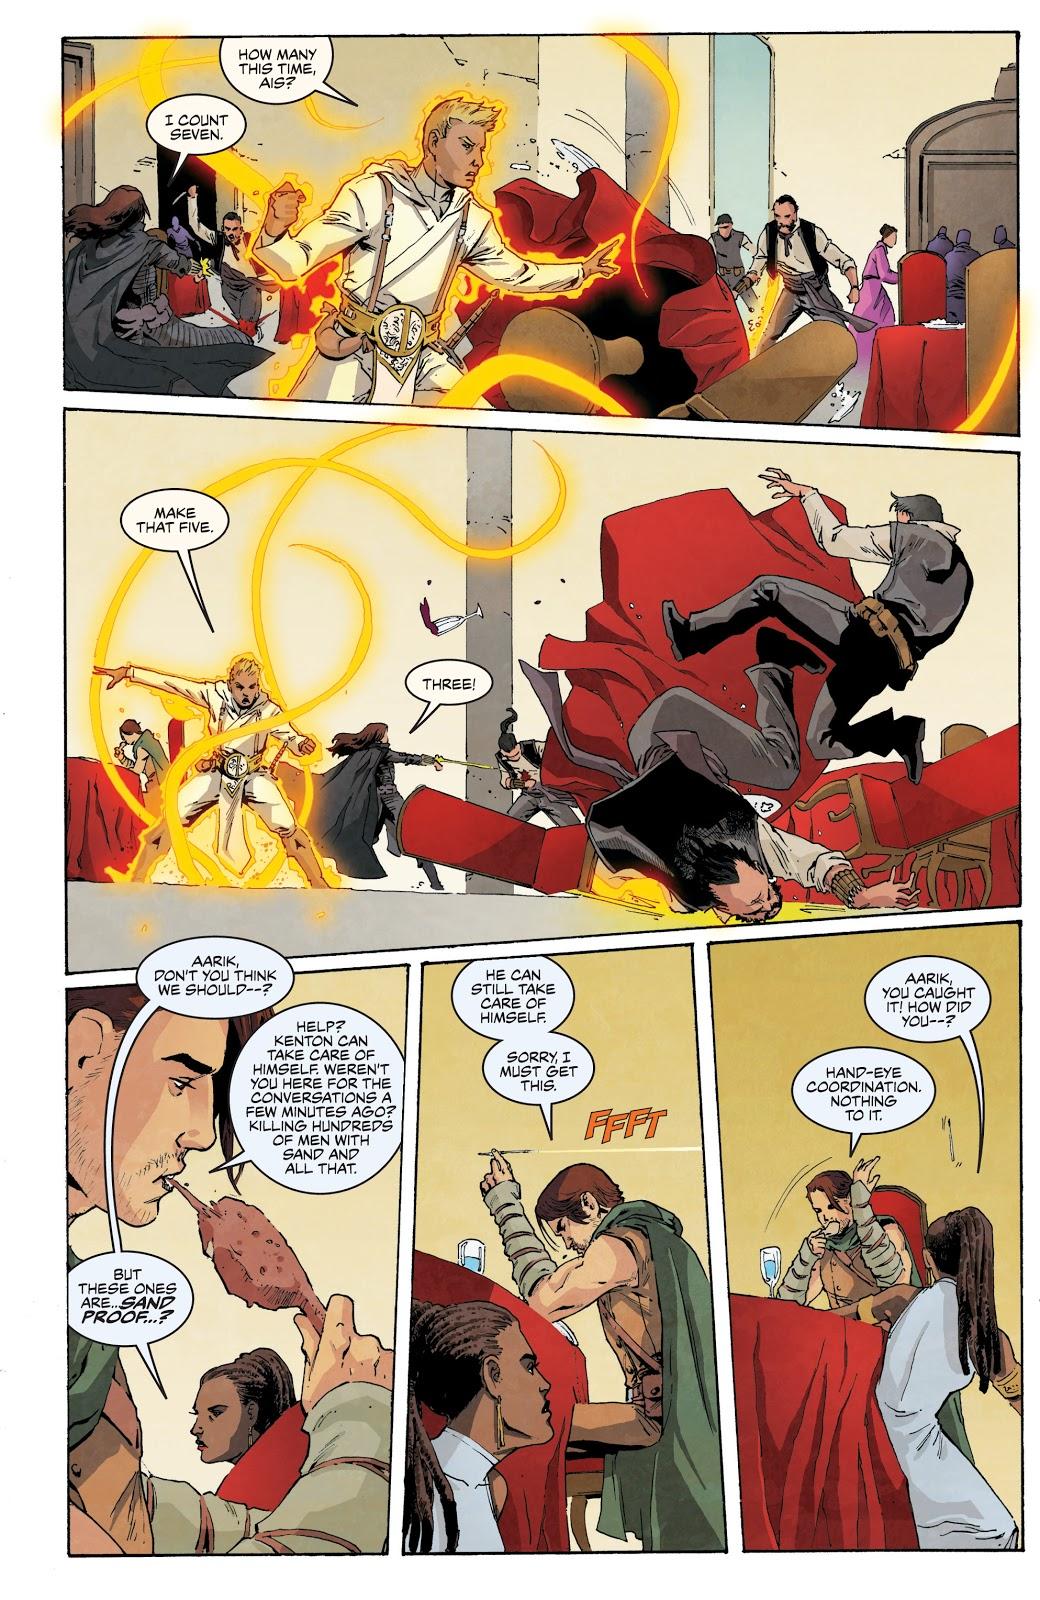 White Sand graphic novel review